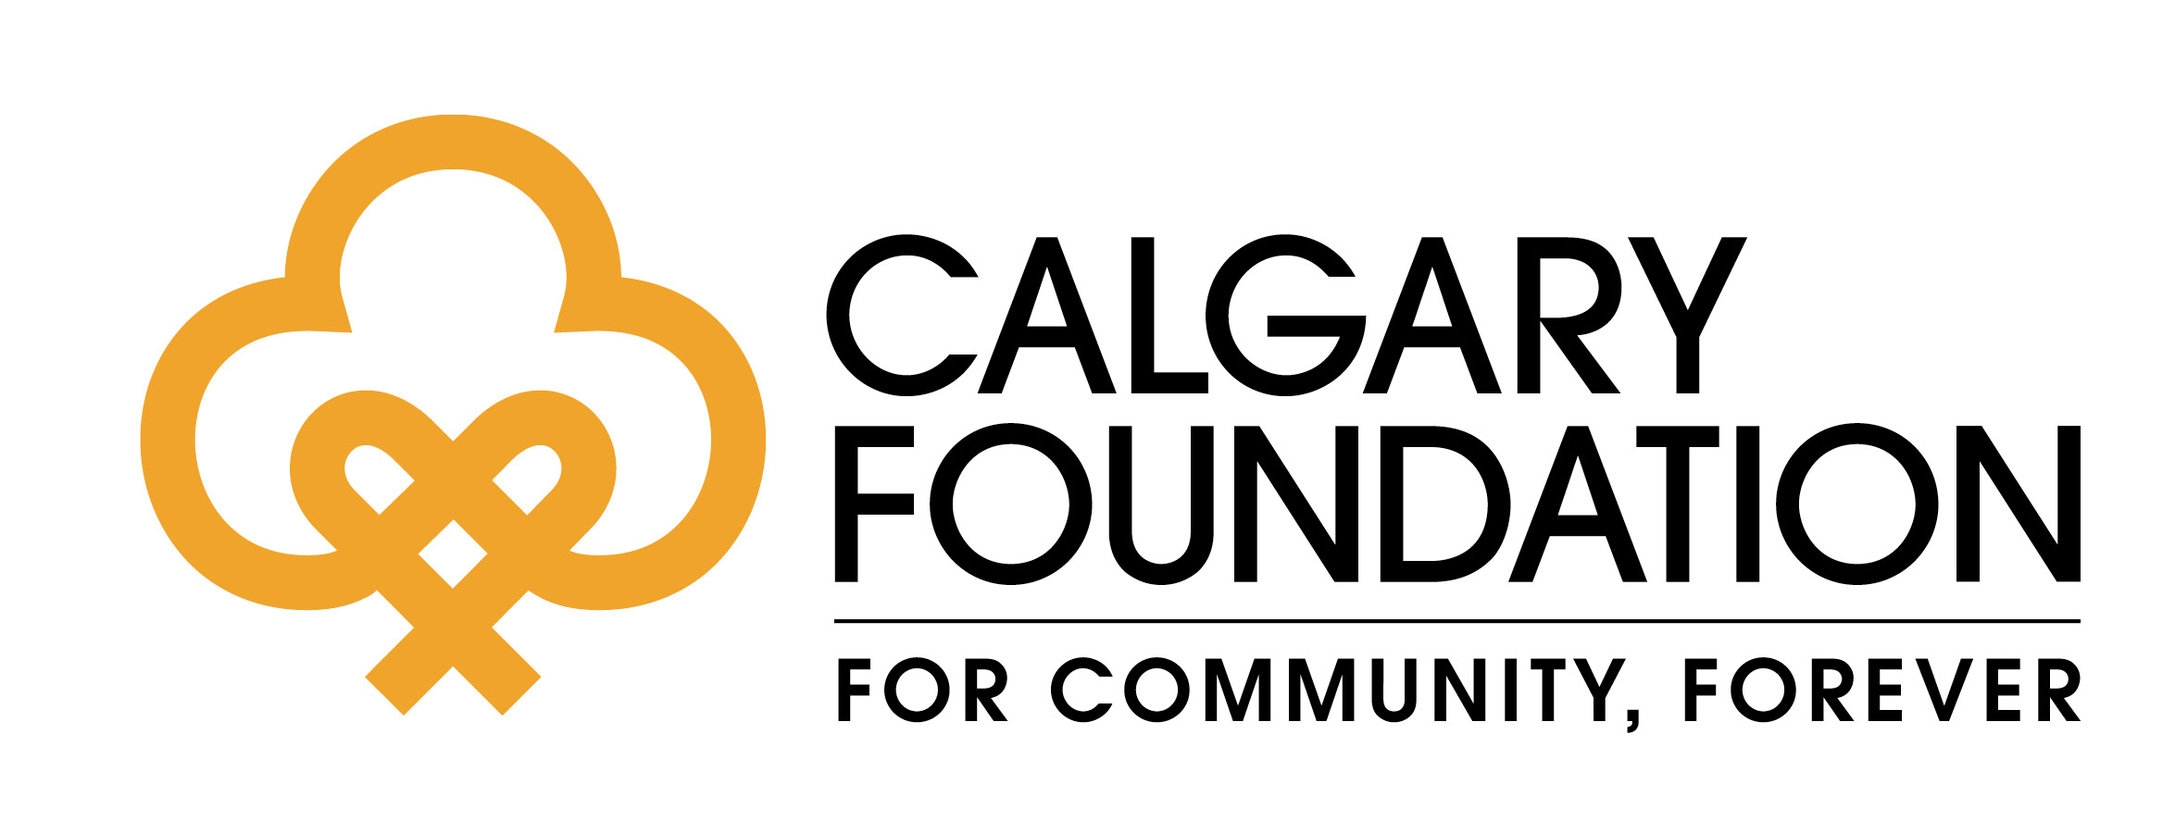 calgary-foundation-logo-LARGER-tagline-RGB.jpg